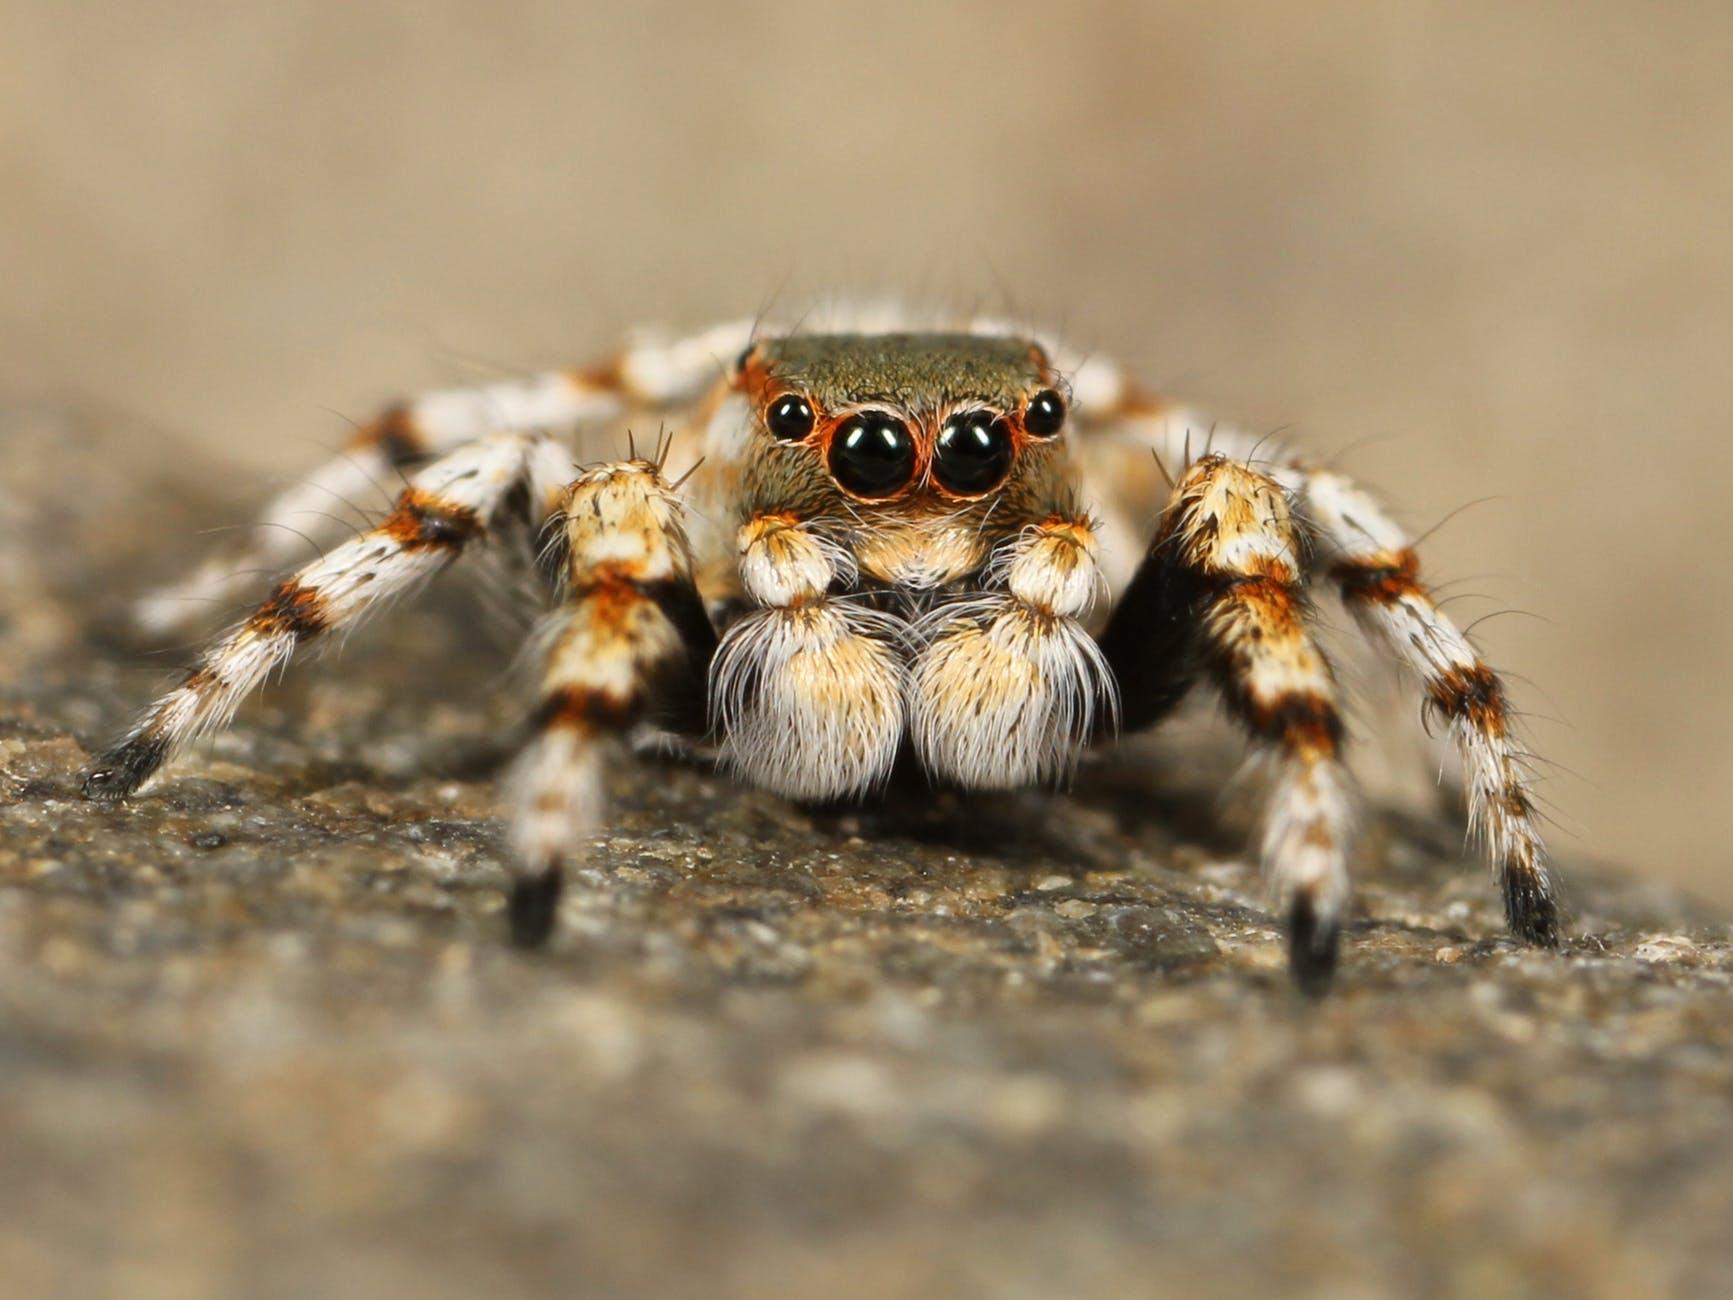 jumping-spider-tarantula-bird-spider-insect-68186.jpeg